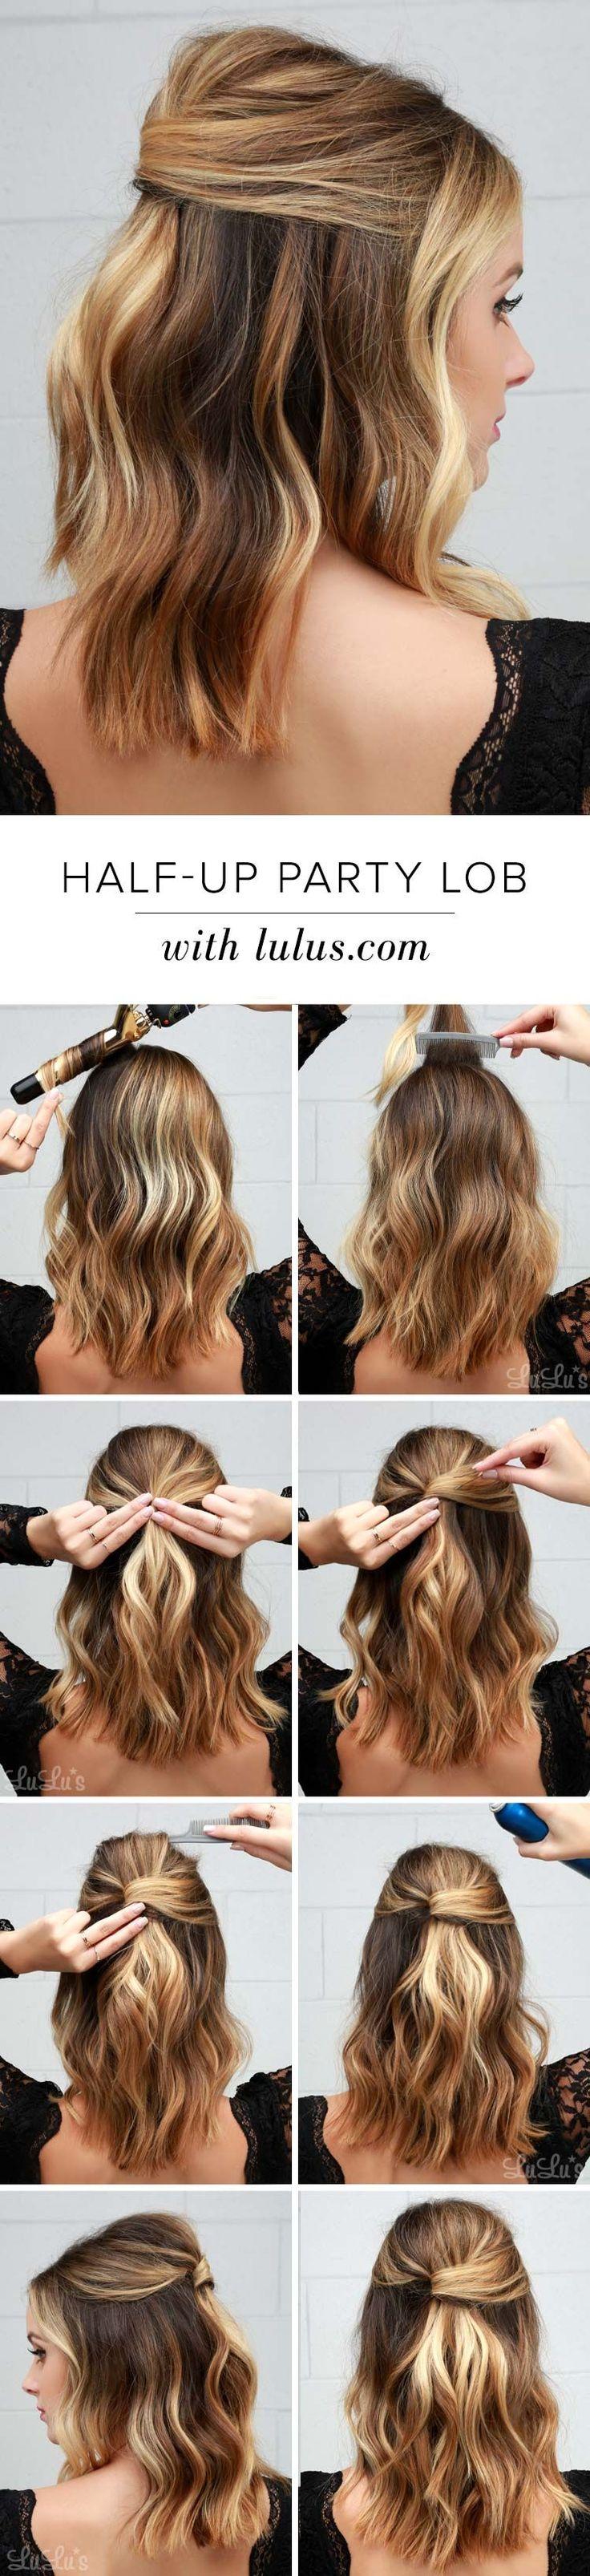 best long hair designs images on Pinterest